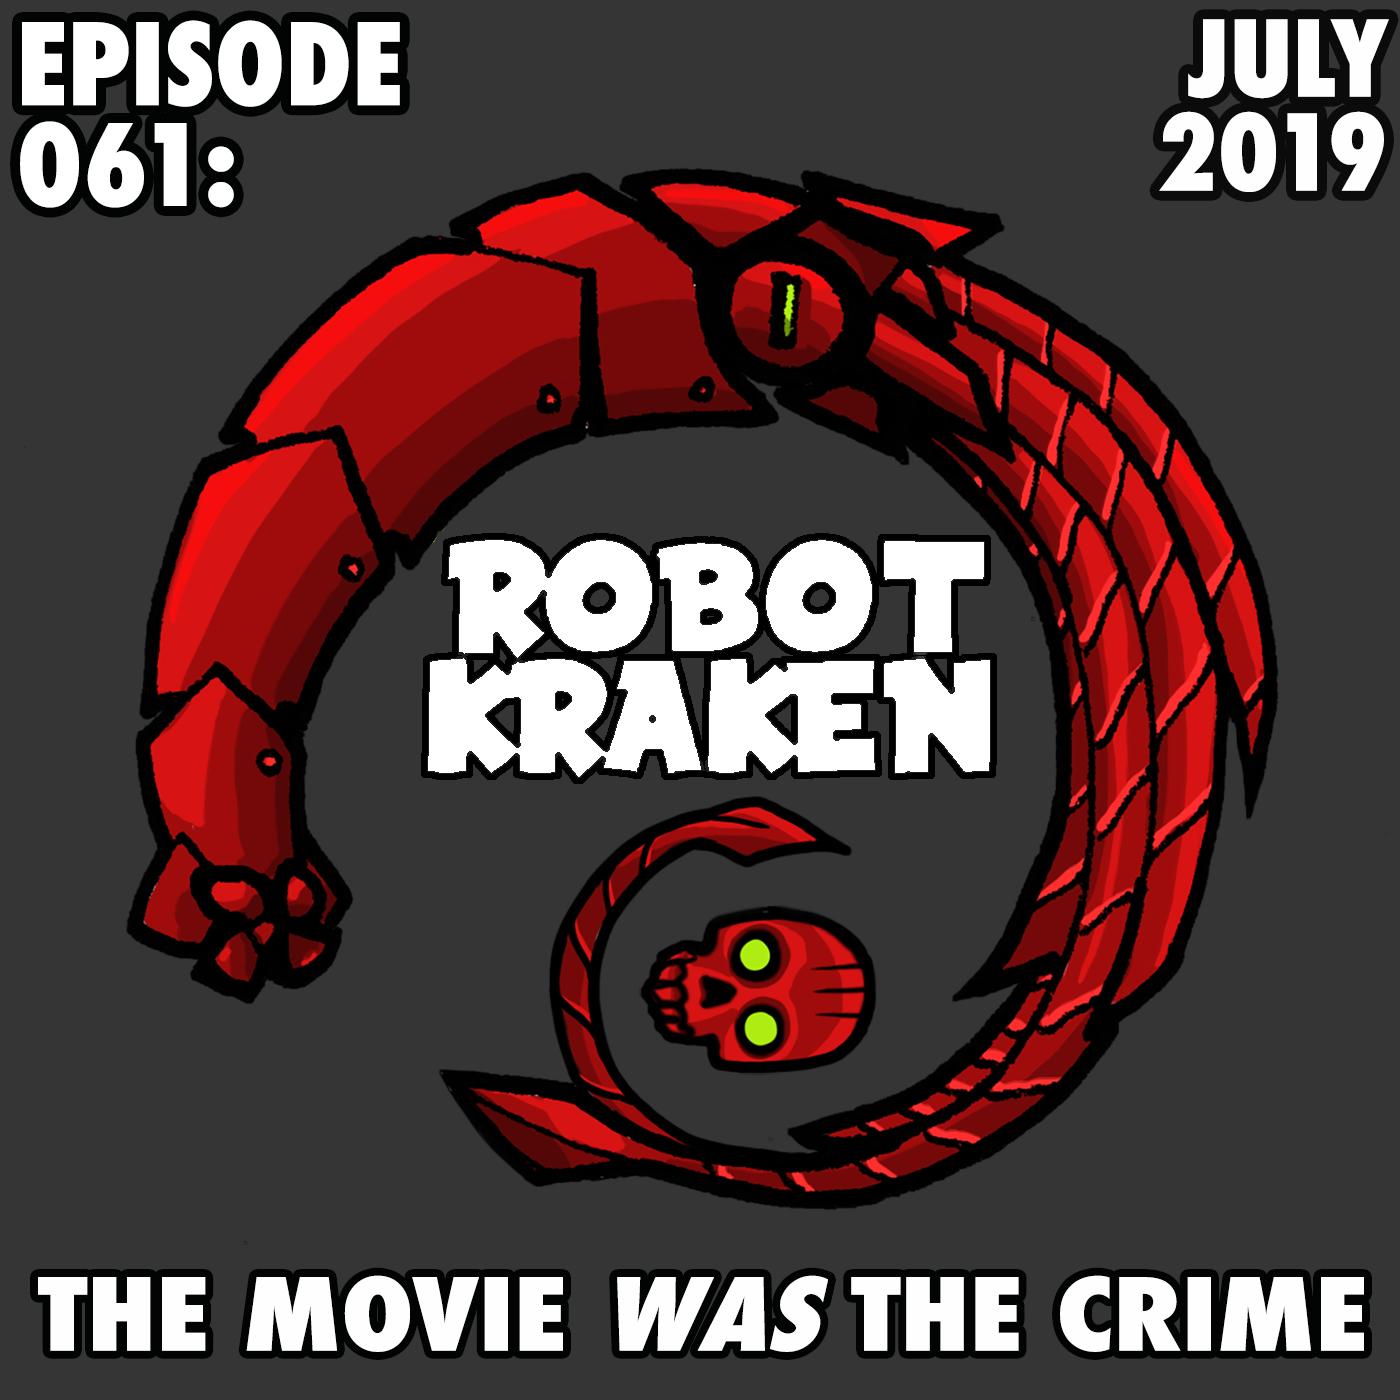 Robot-Kraken-061-Cover.png